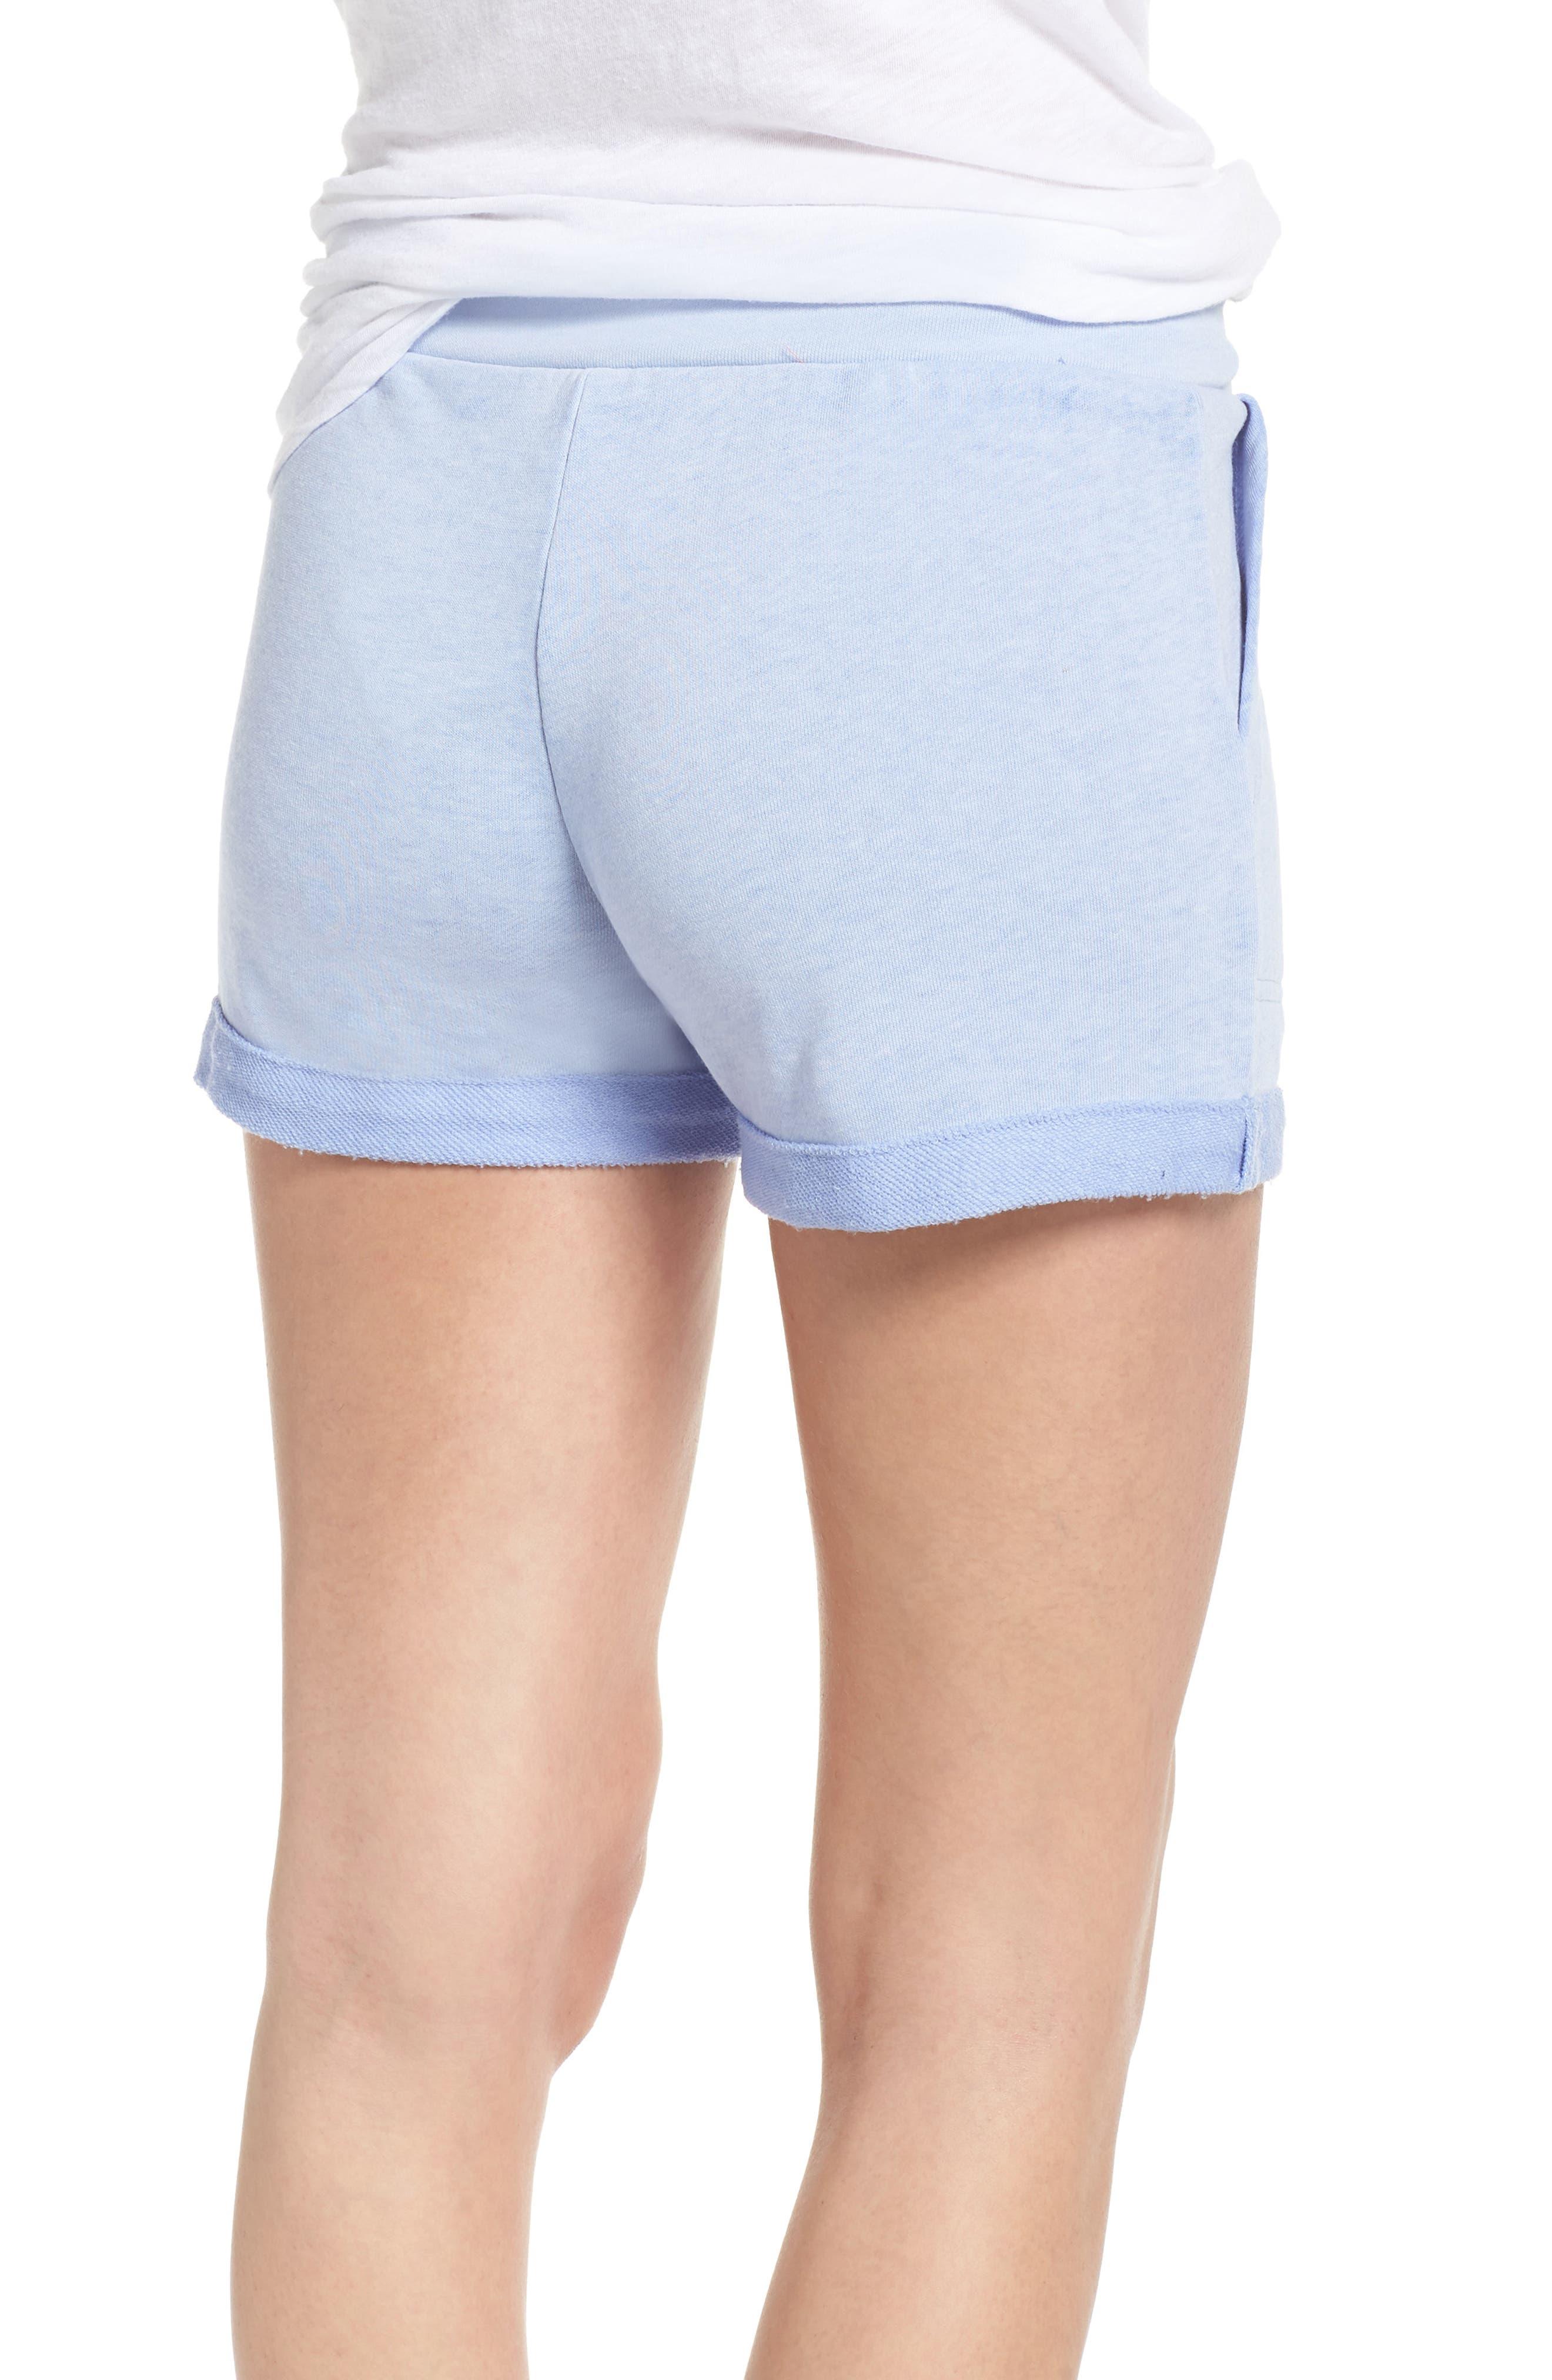 Lounge Shorts,                             Alternate thumbnail 2, color,                             Lavender Lustre